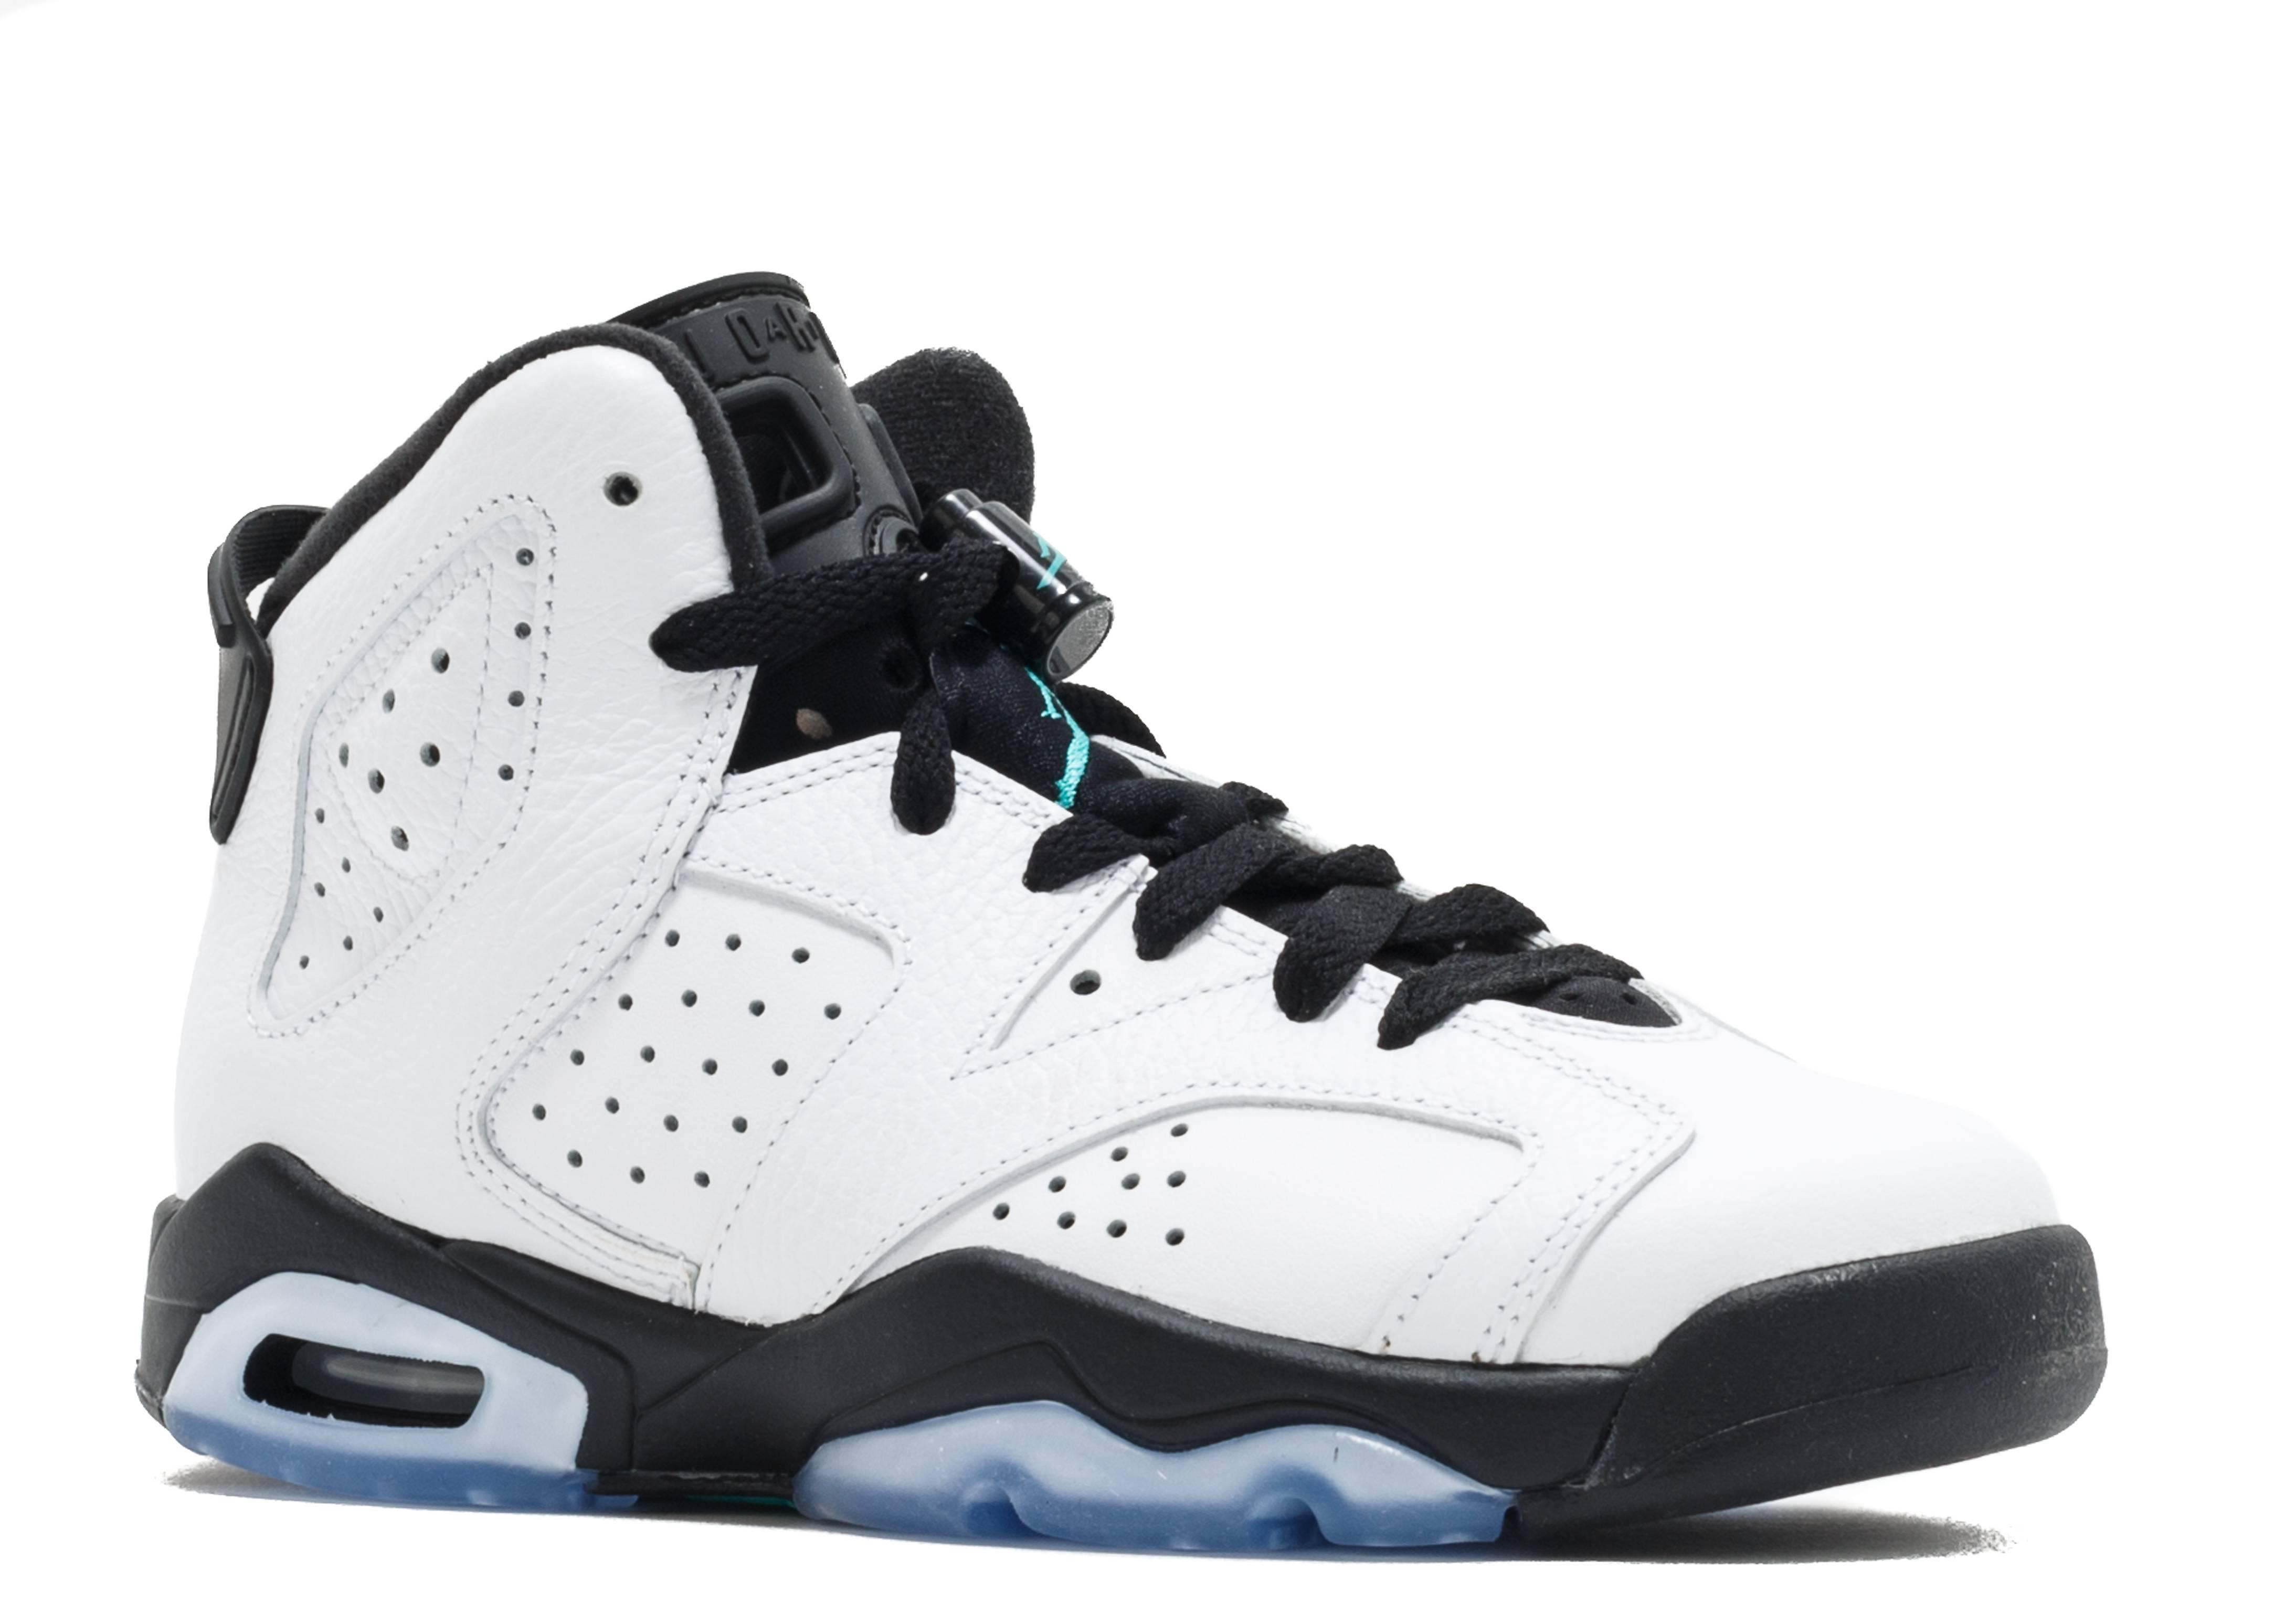 sports shoes 81627 97704 ... uk air jordan retro 6 bg gs hyper jade air jordan 384665 122 white  white hyper